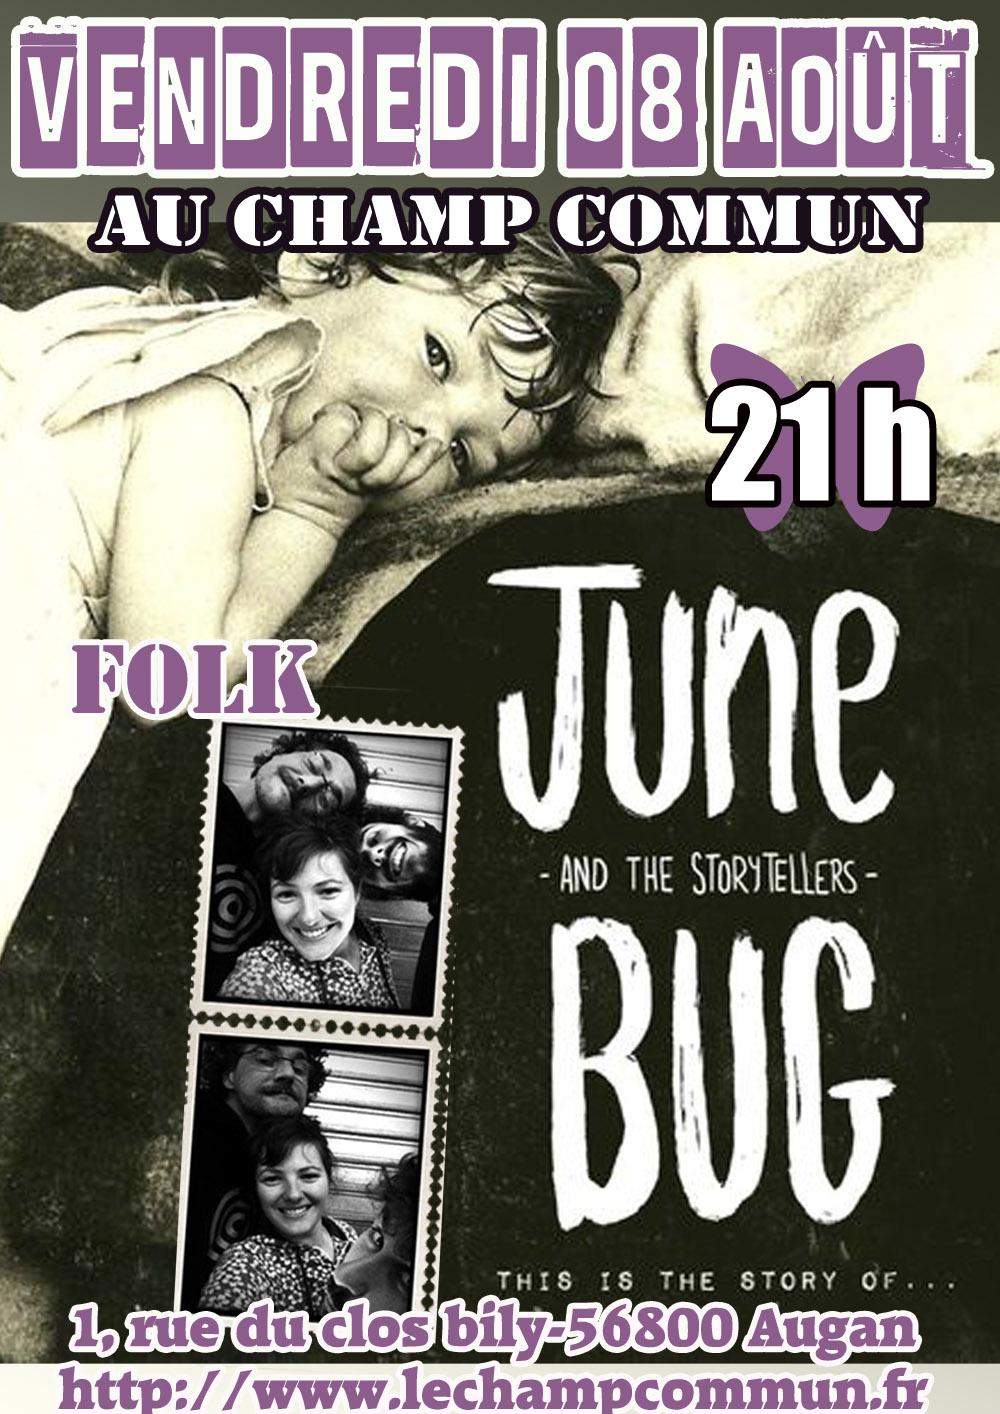 Vendredi 08 Août à 21h au Champ commun- Folk avec June Bug & the story tellers